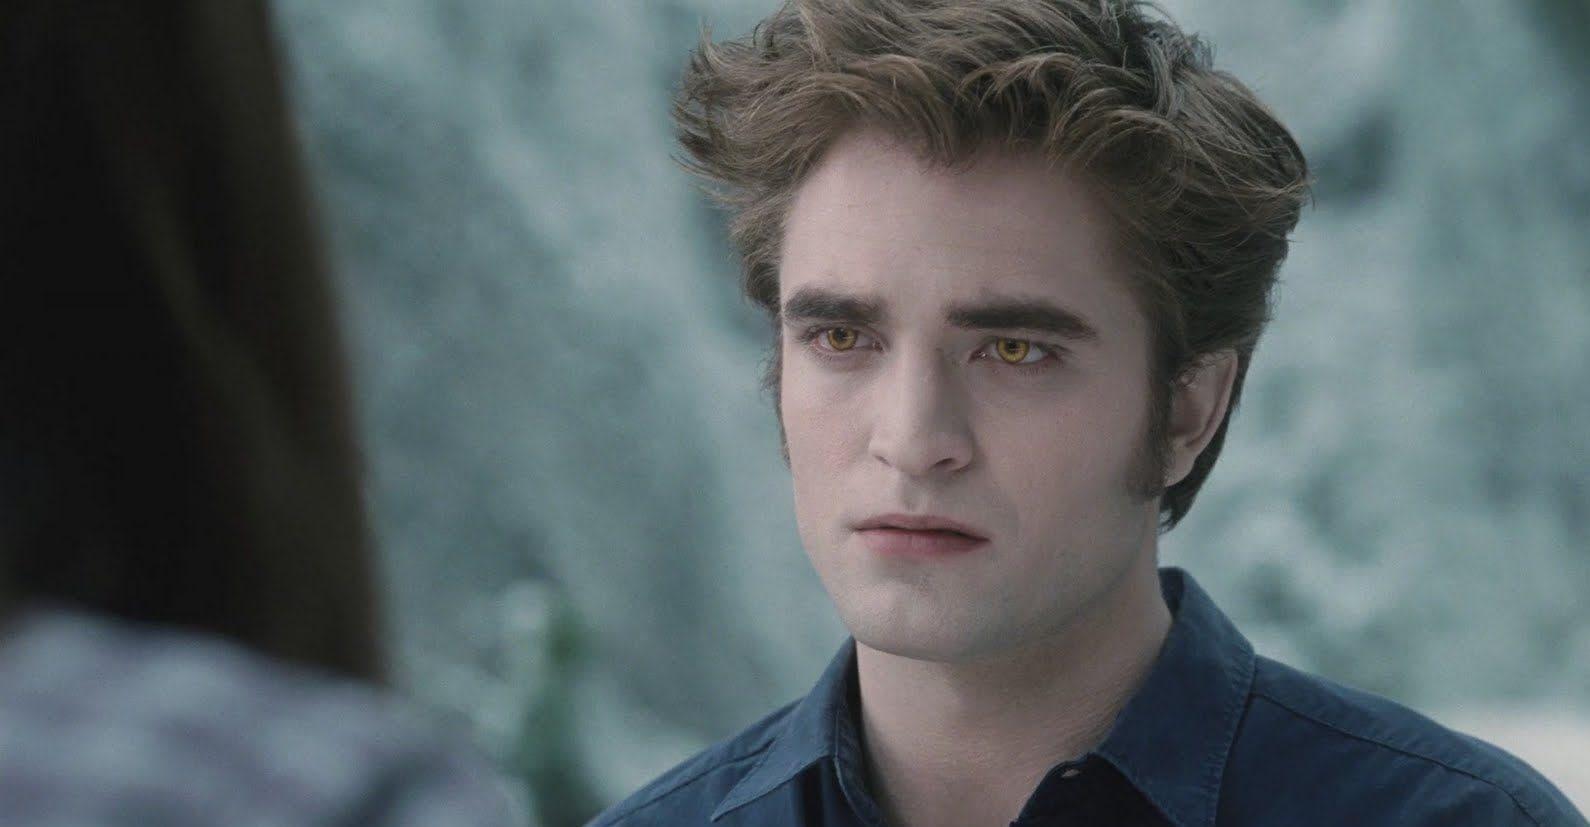 Of twilight cast the Twilight Cast: